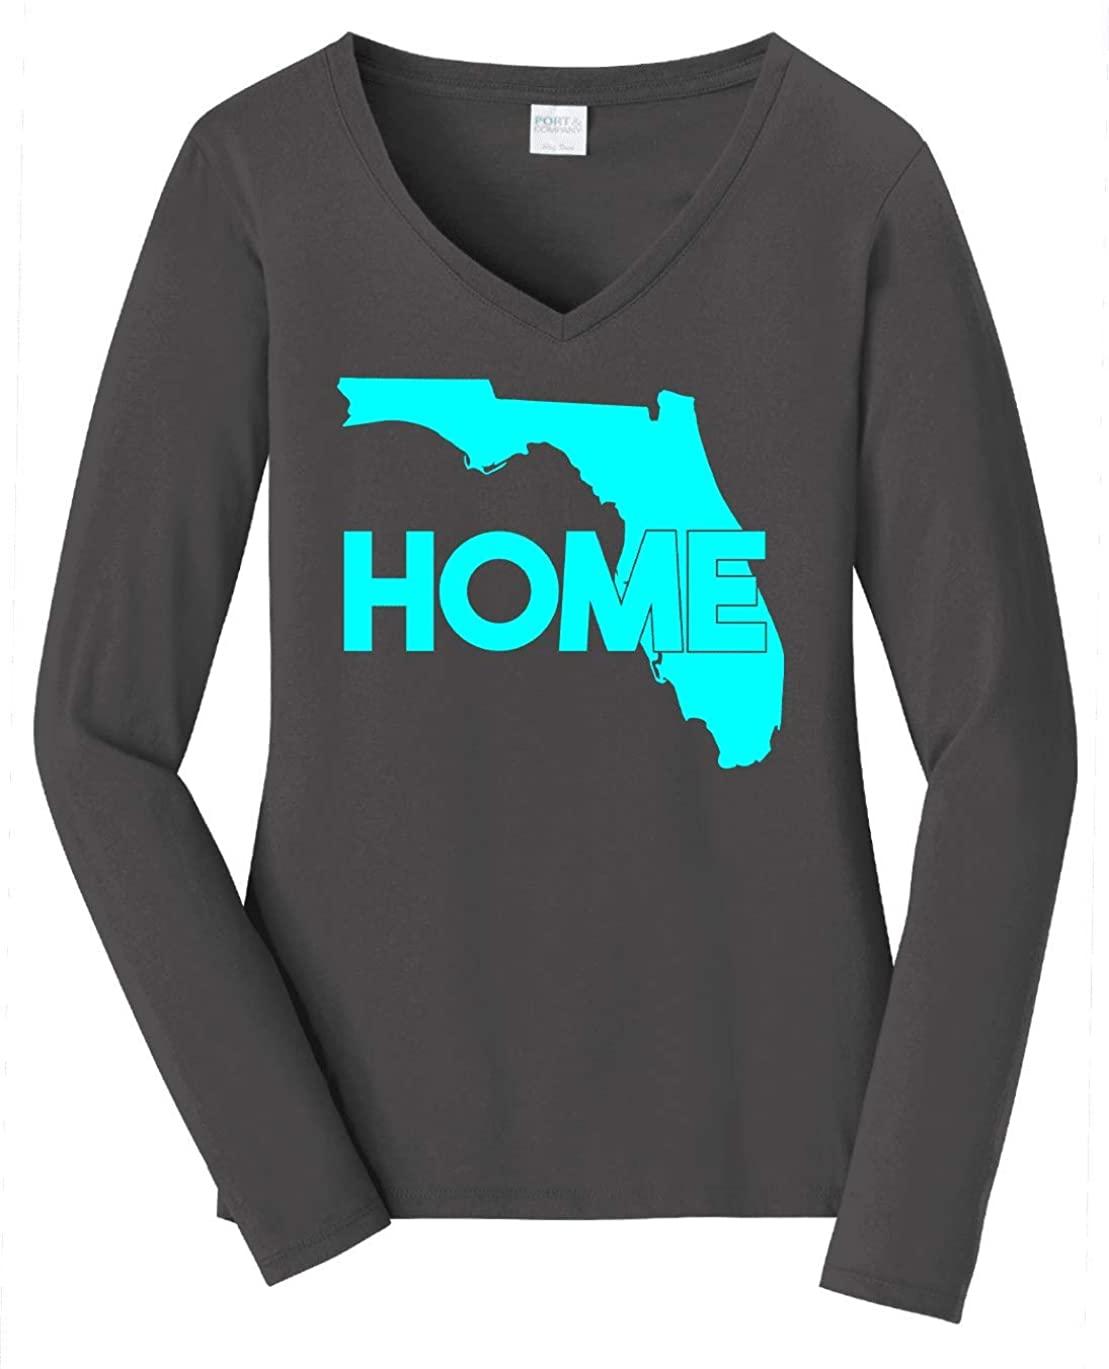 HARD EDGE DESIGN Women's Florida Home Long Sleeve V Neck T-Shirt, X-Large, Charcoal